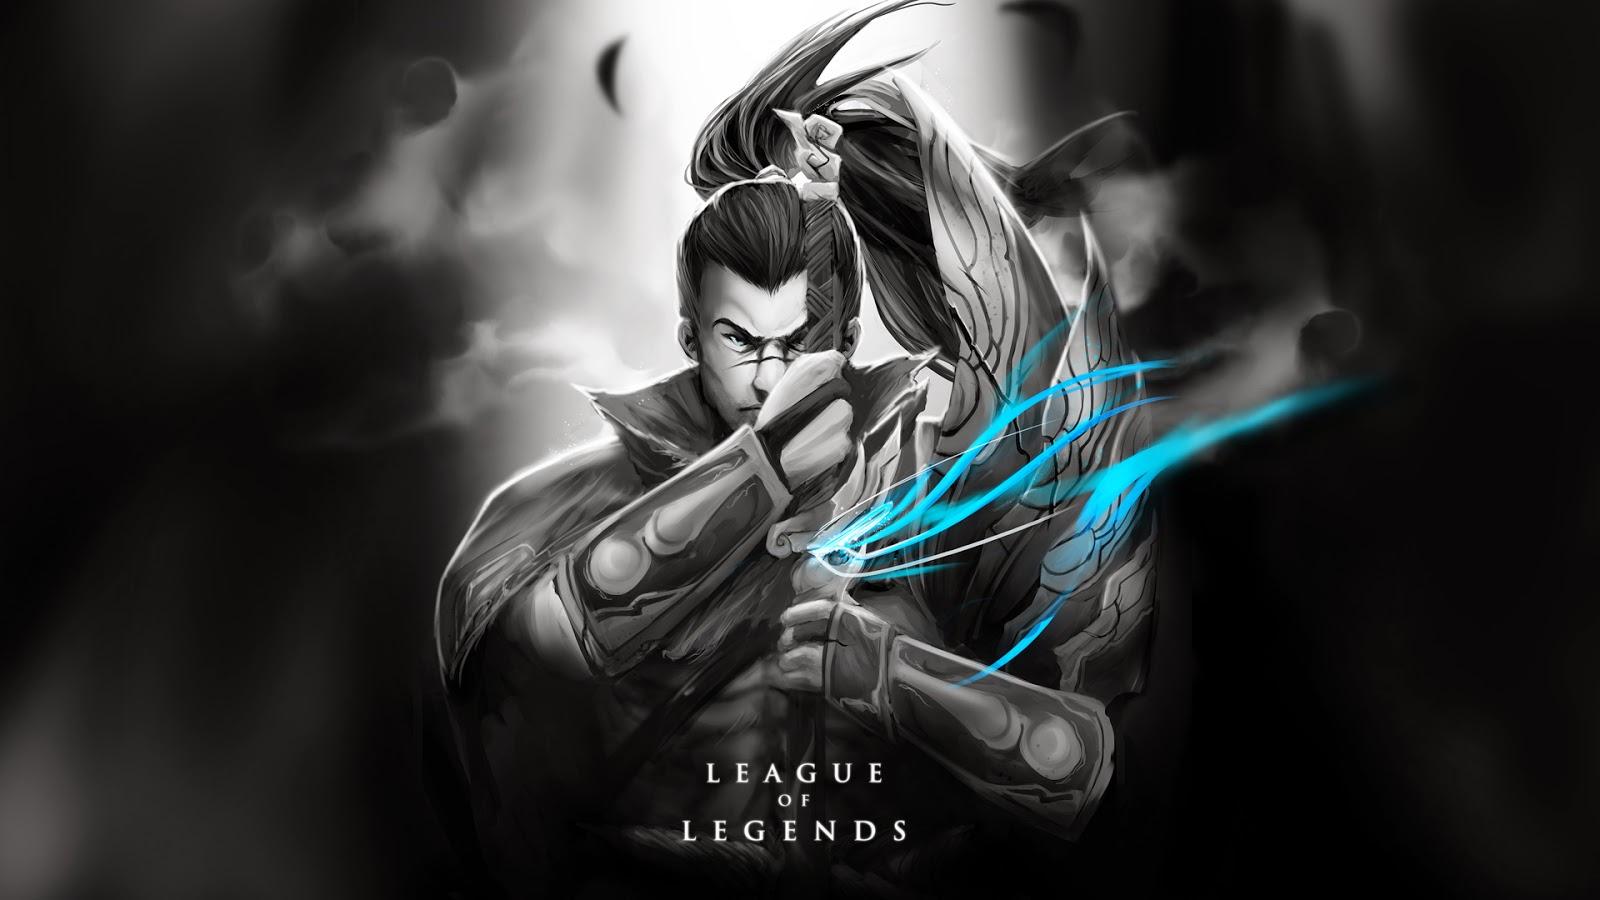 League of legends lol collection 24 3